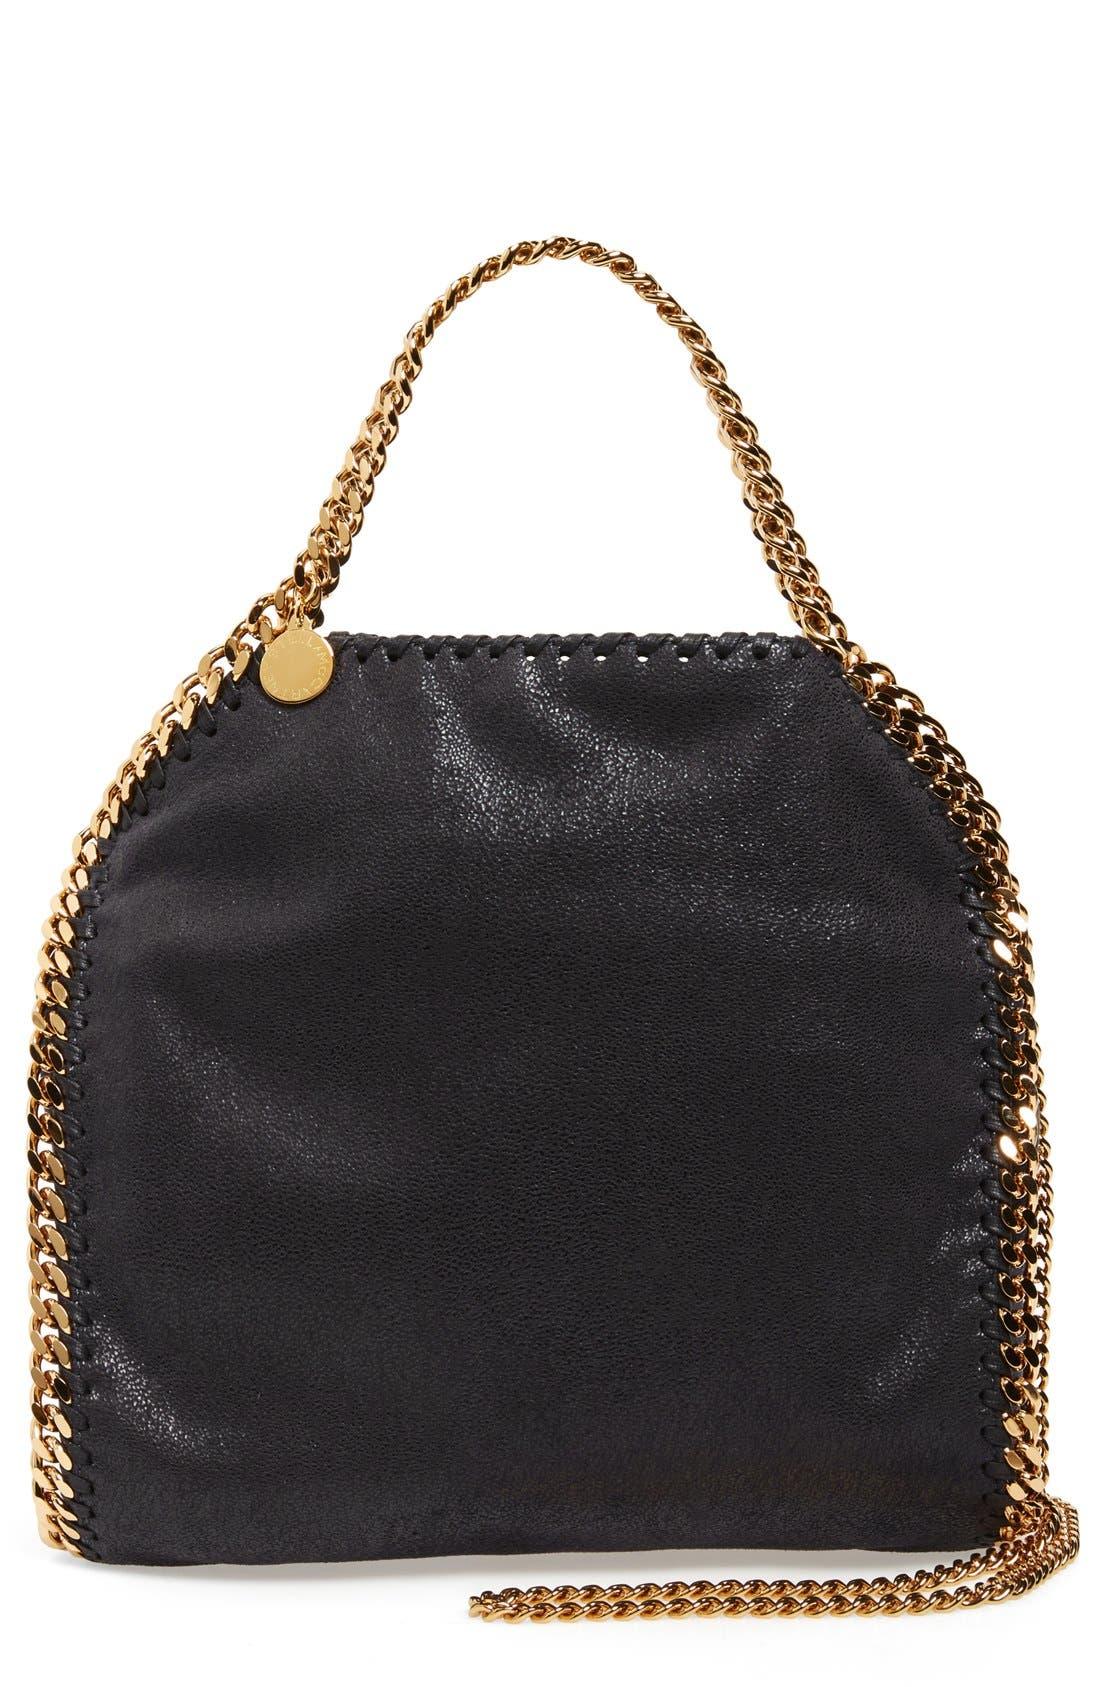 'Mini Falabella - Shaggy Deer' Faux Leather Tote,                             Main thumbnail 1, color,                             BLACK W/ GOLD